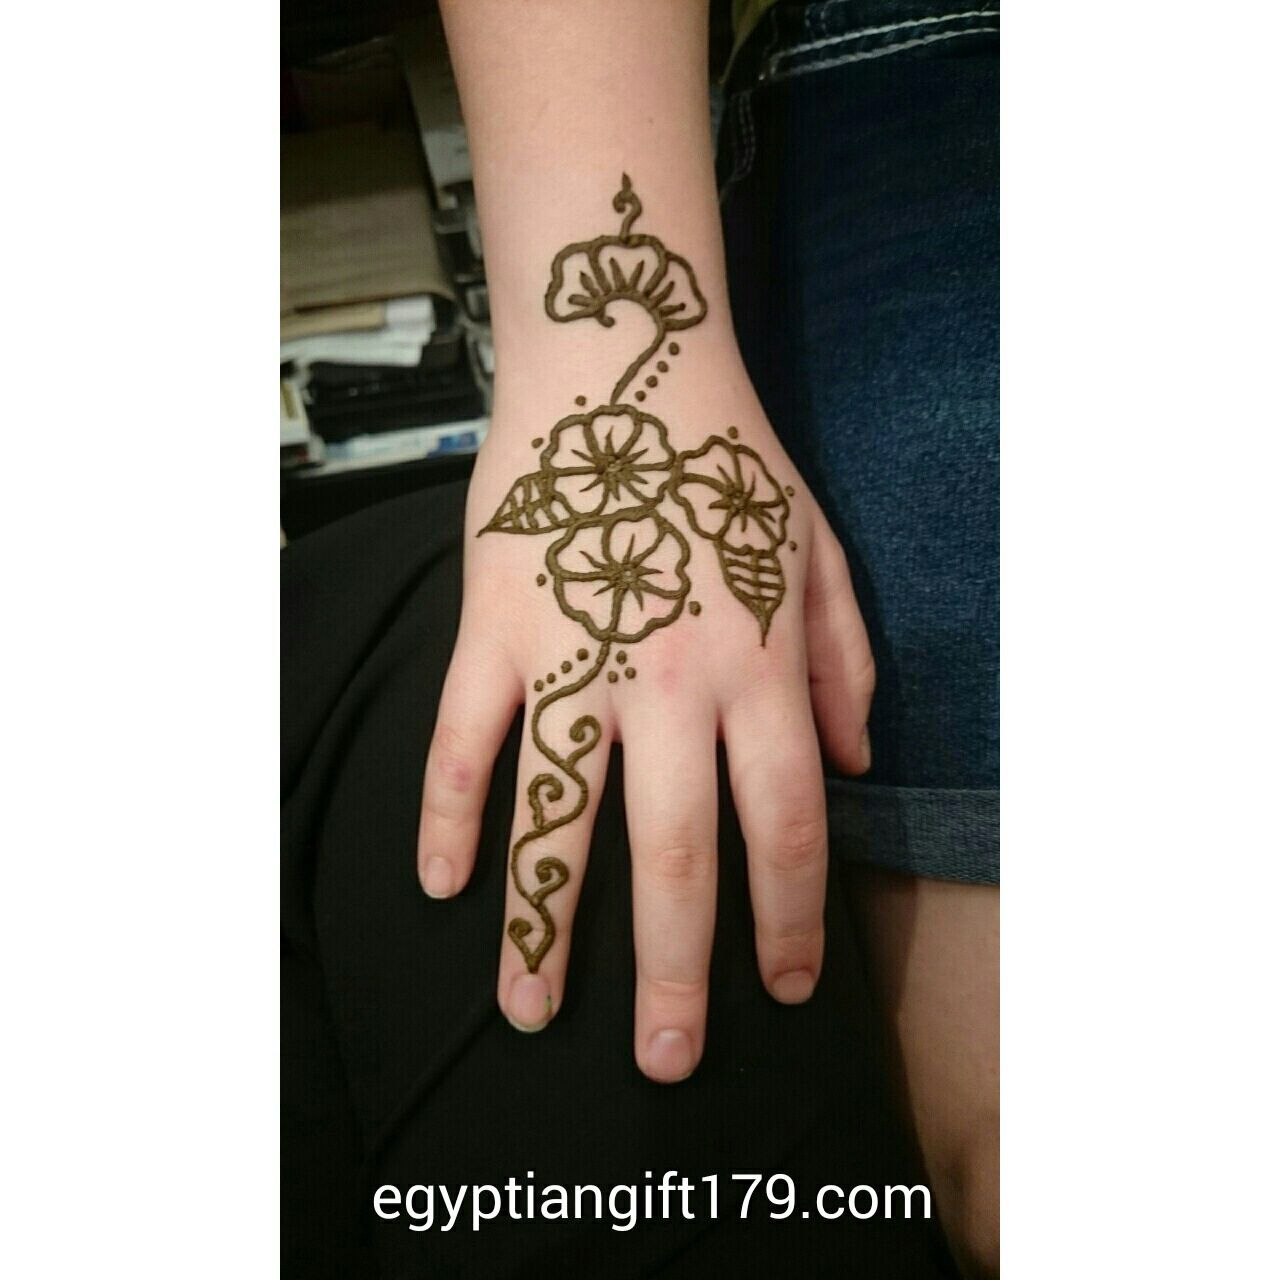 Egyptian Gift Corner Henna shop, Henna tattoo, Tattoo